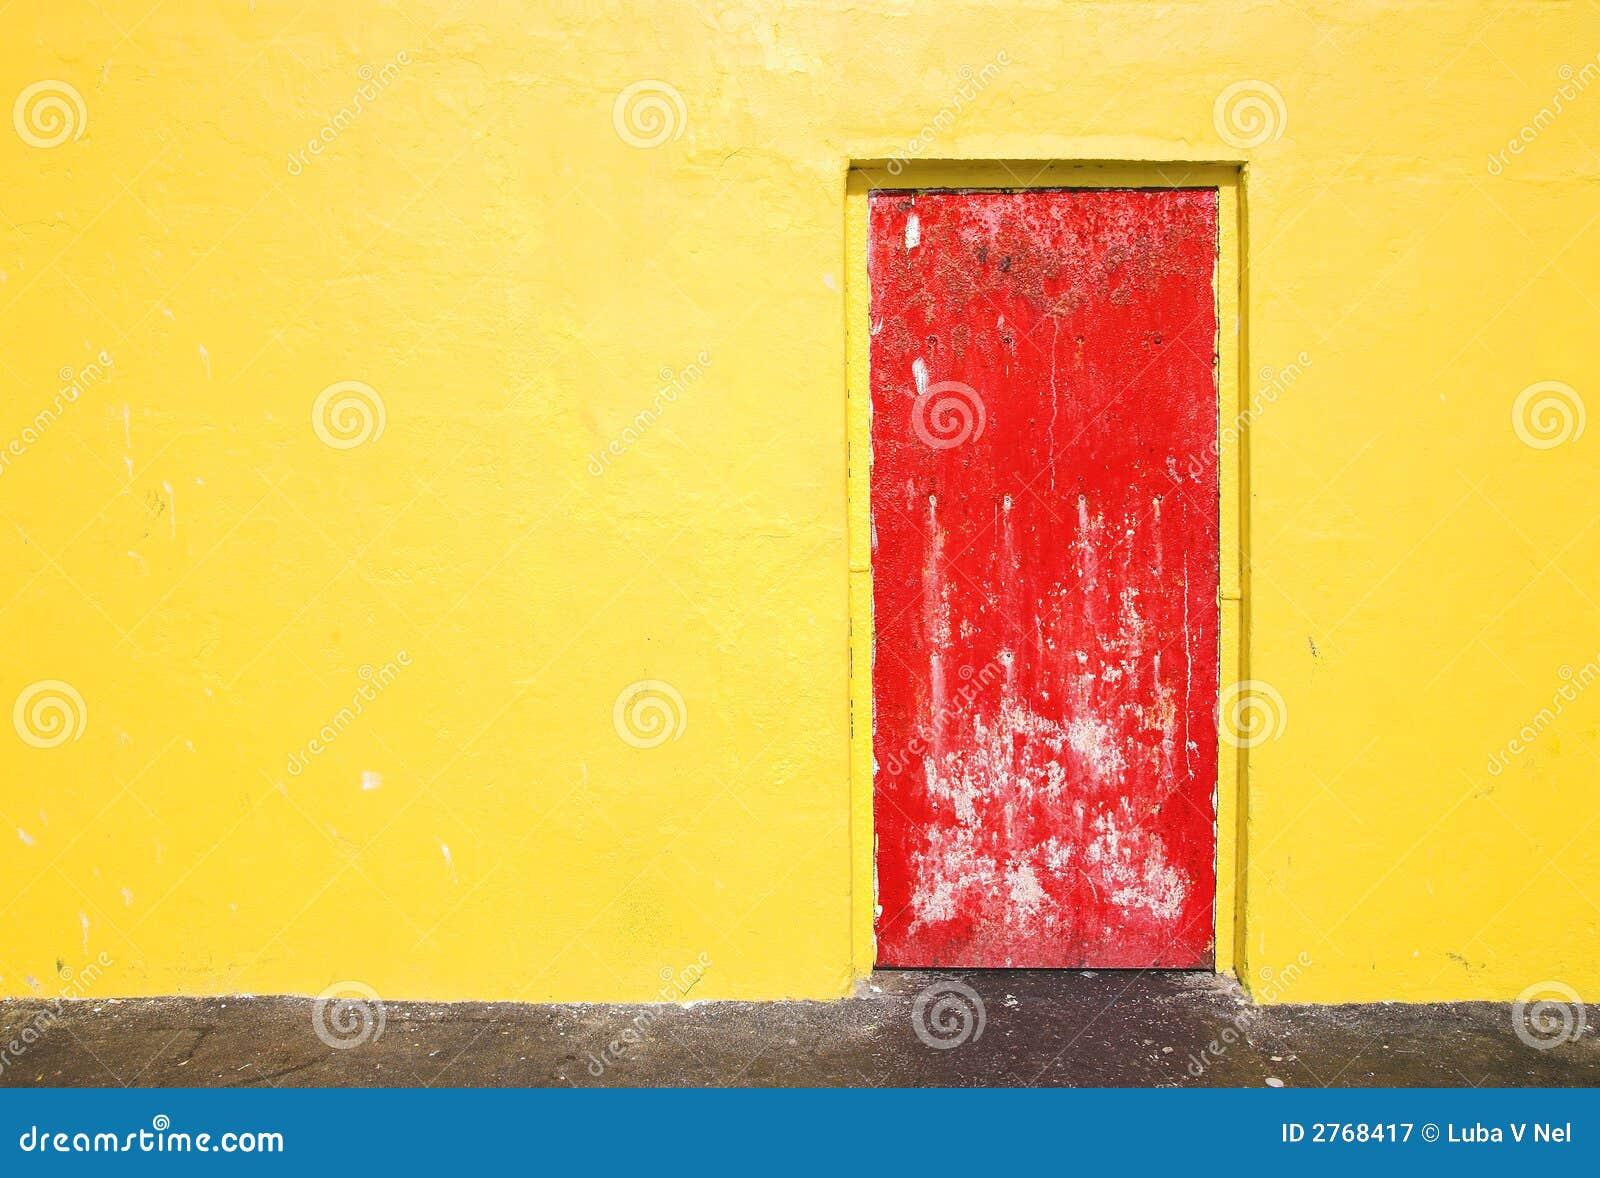 trappe rouge sur le mur jaune image stock image du peint grunge 2768417. Black Bedroom Furniture Sets. Home Design Ideas